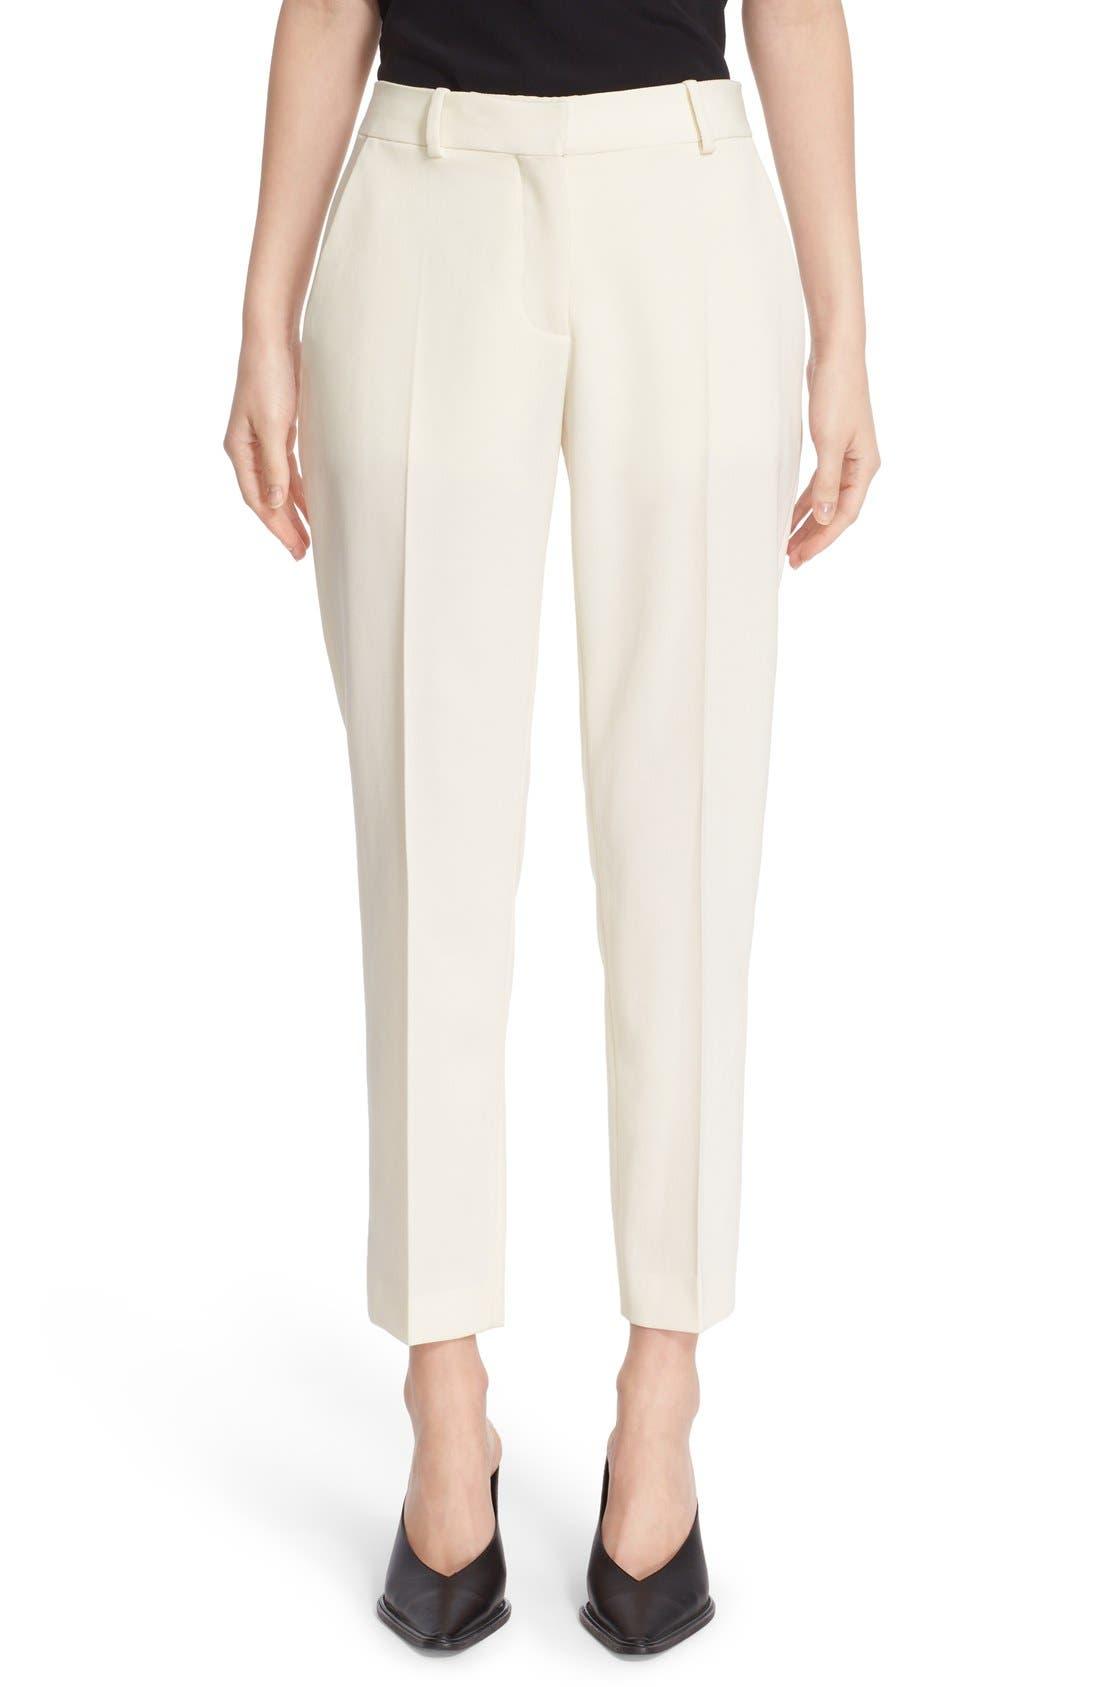 Alternate Image 1 Selected - Stella McCartney 'Octavia' Crop Wool Trousers